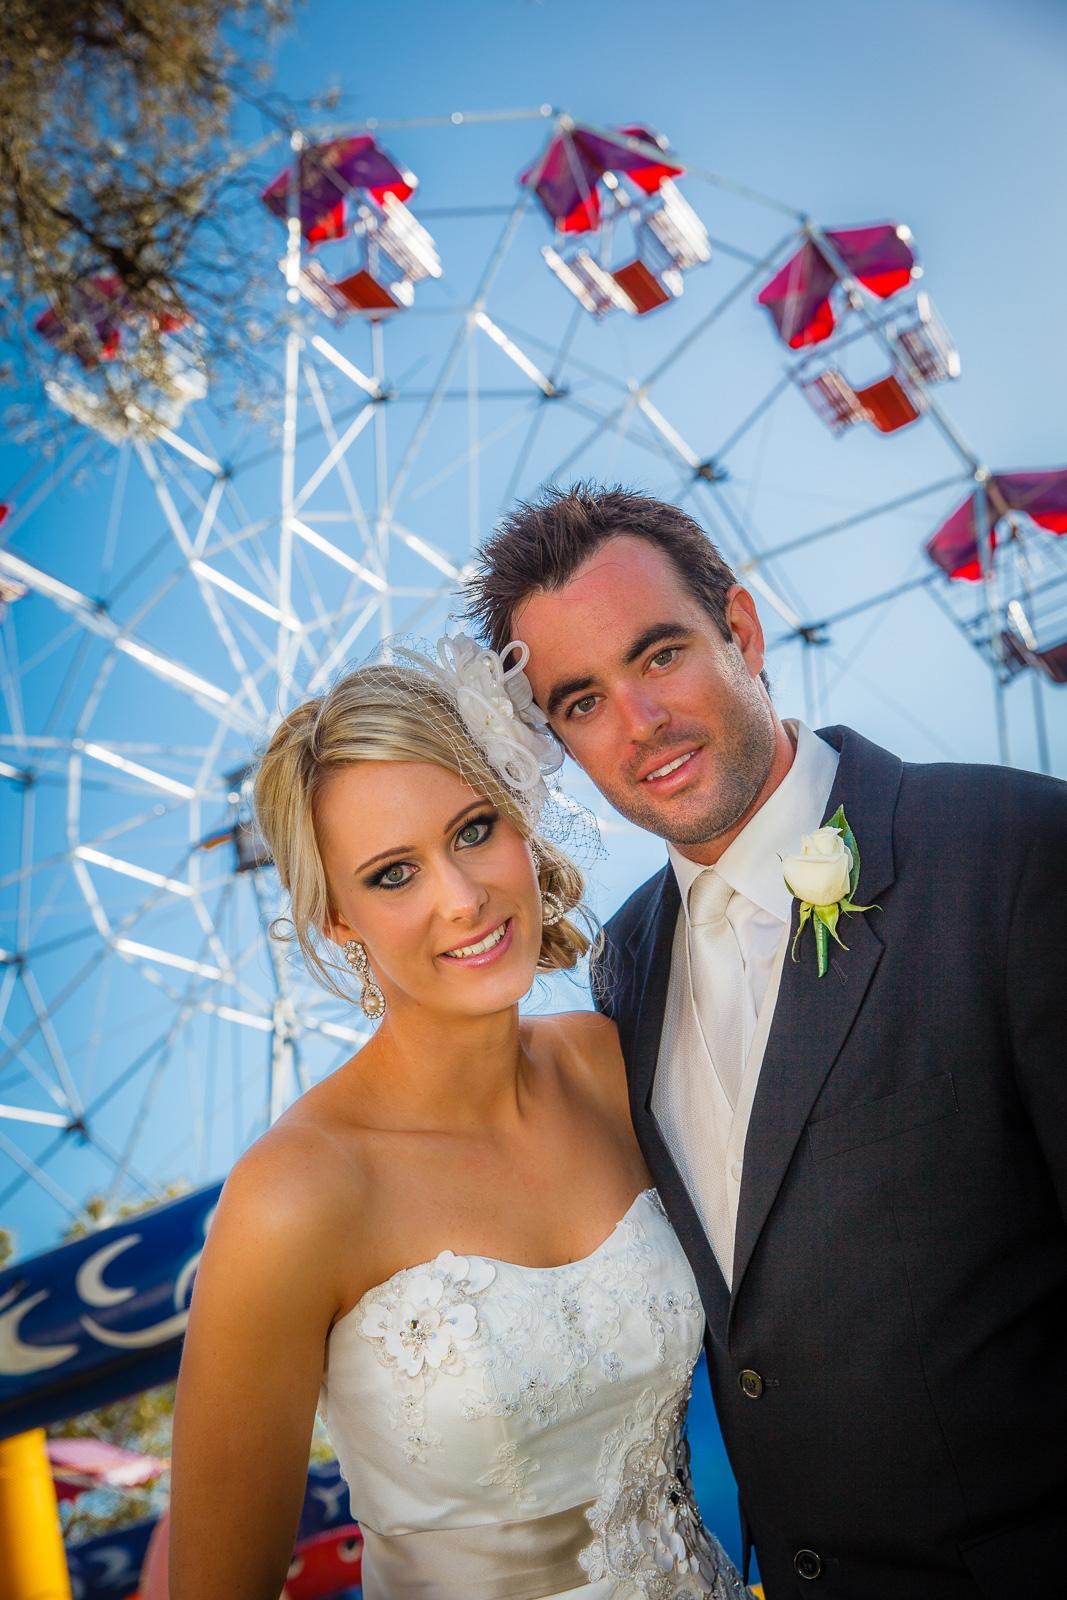 Aimee_Brett_Modern-Vintage-Wedding_036